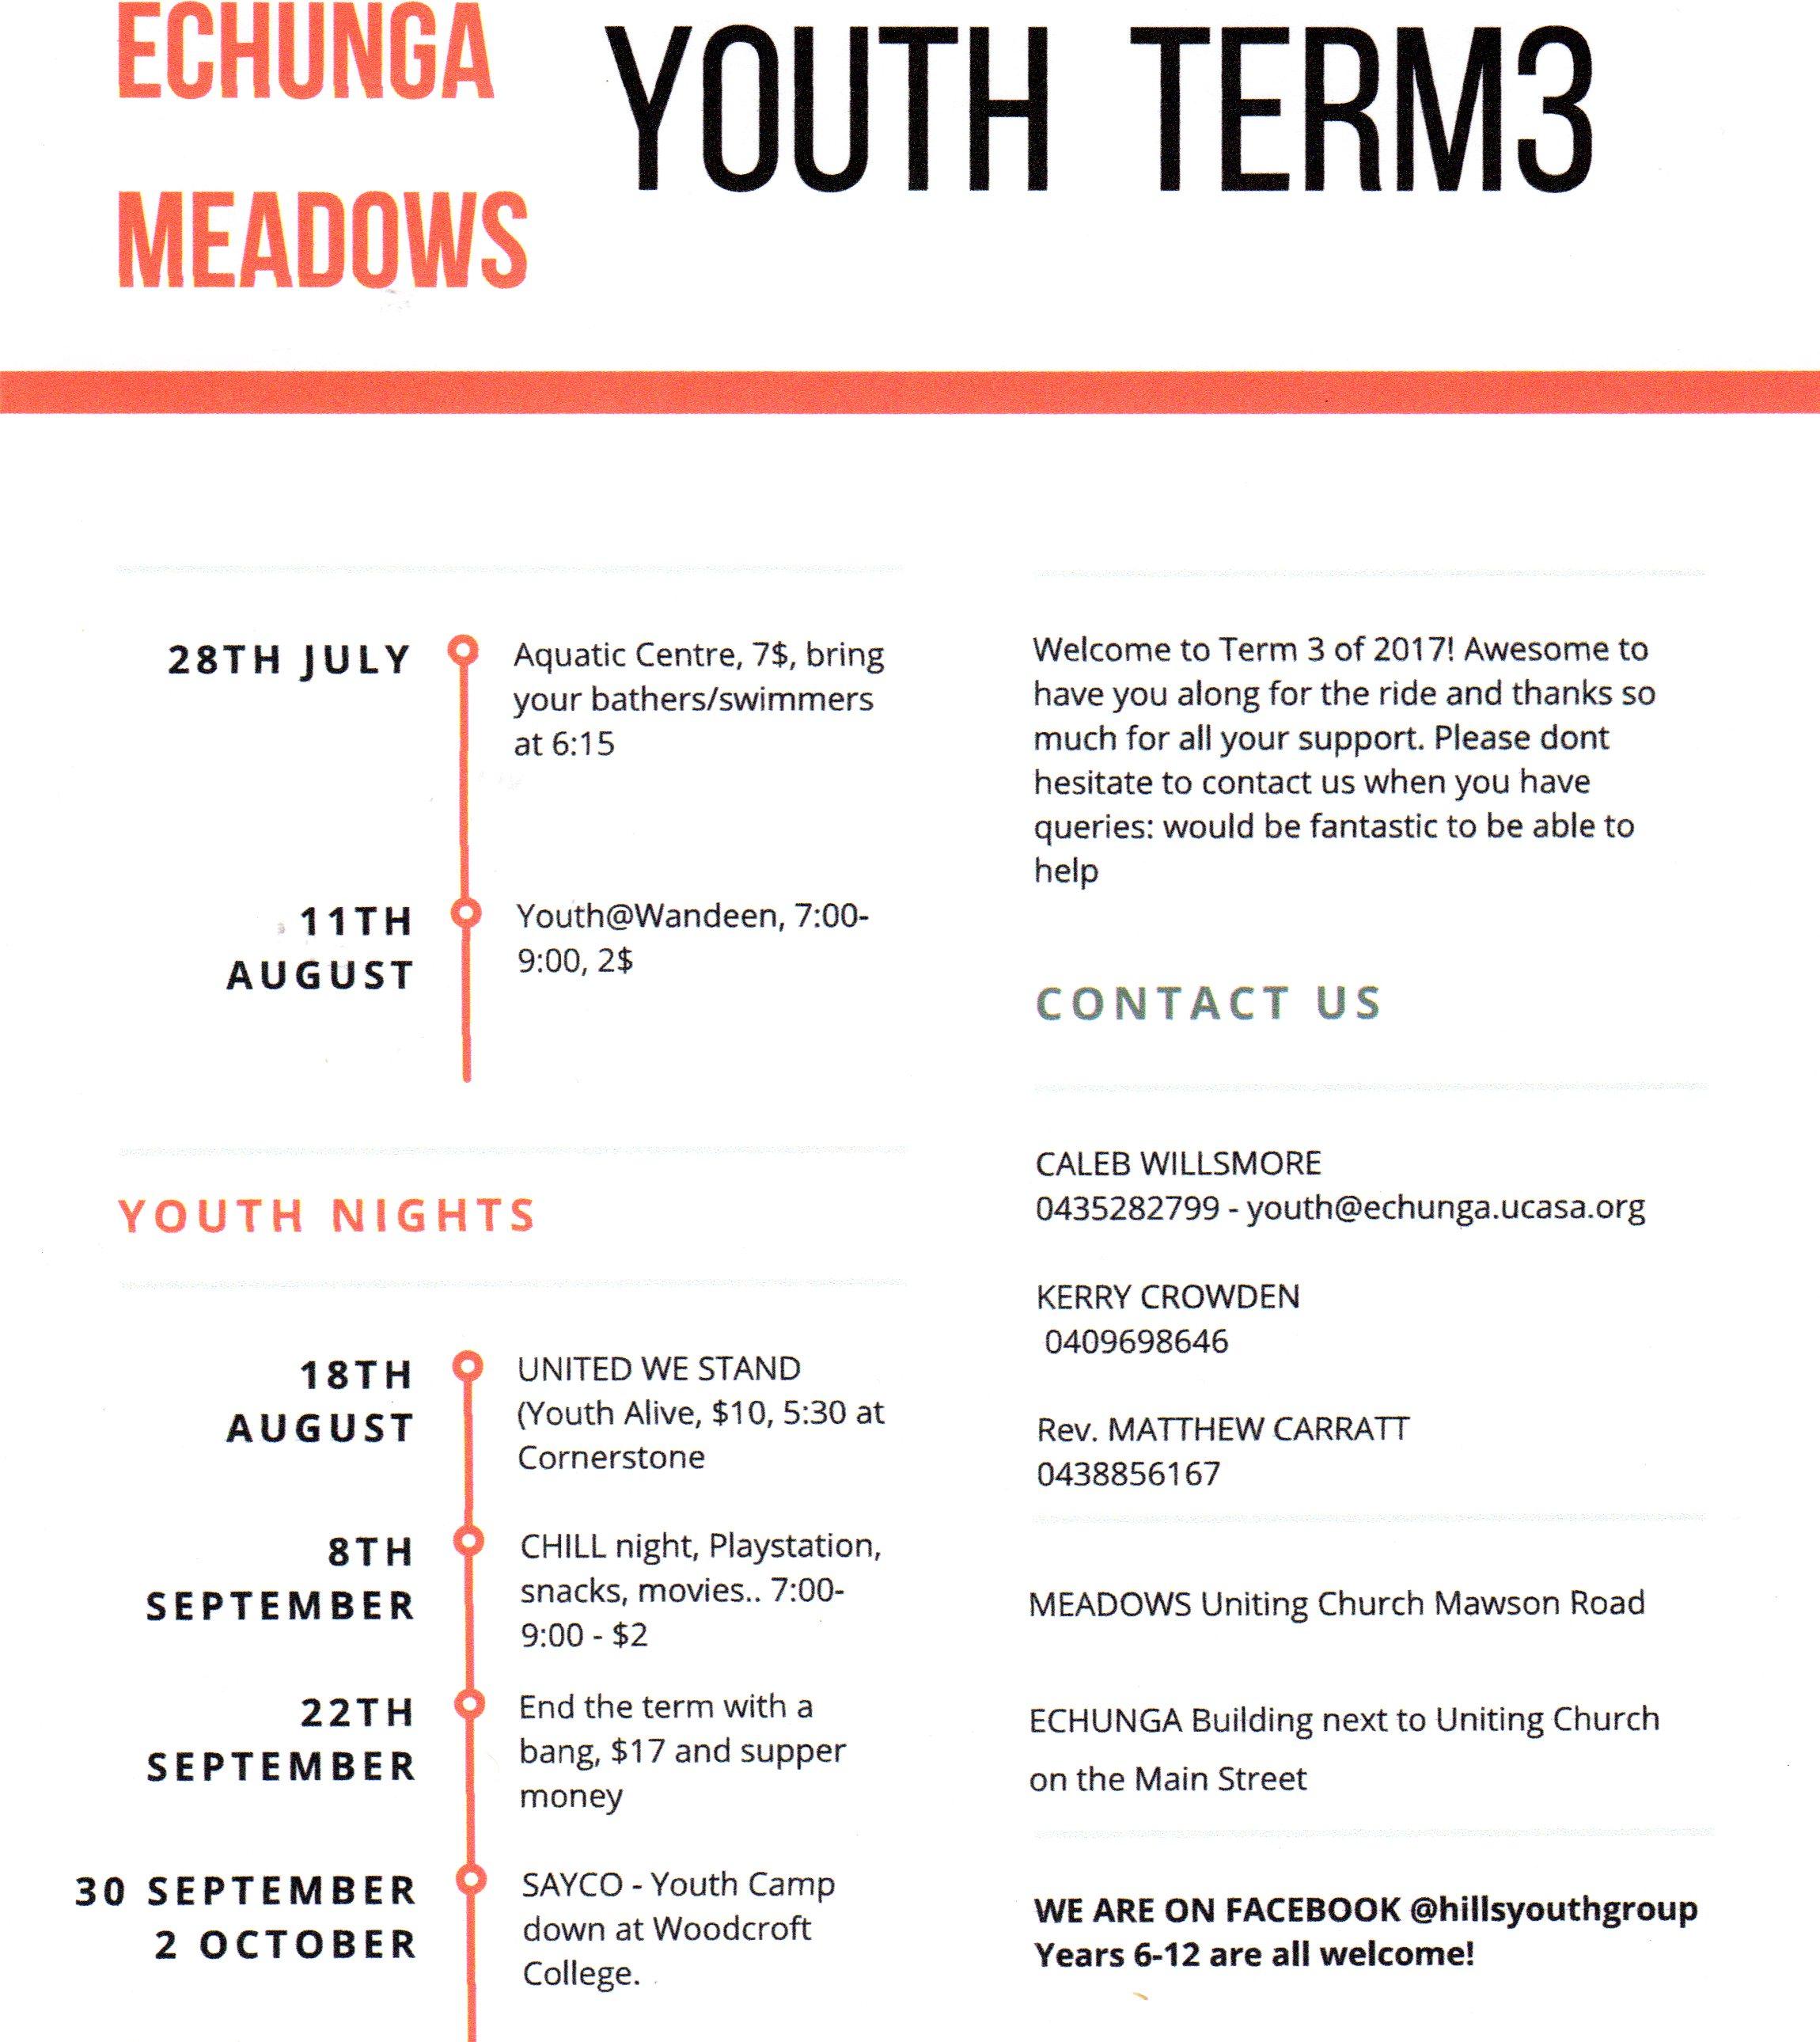 Echunga Meadows Youth term 3 201720170803_11043578